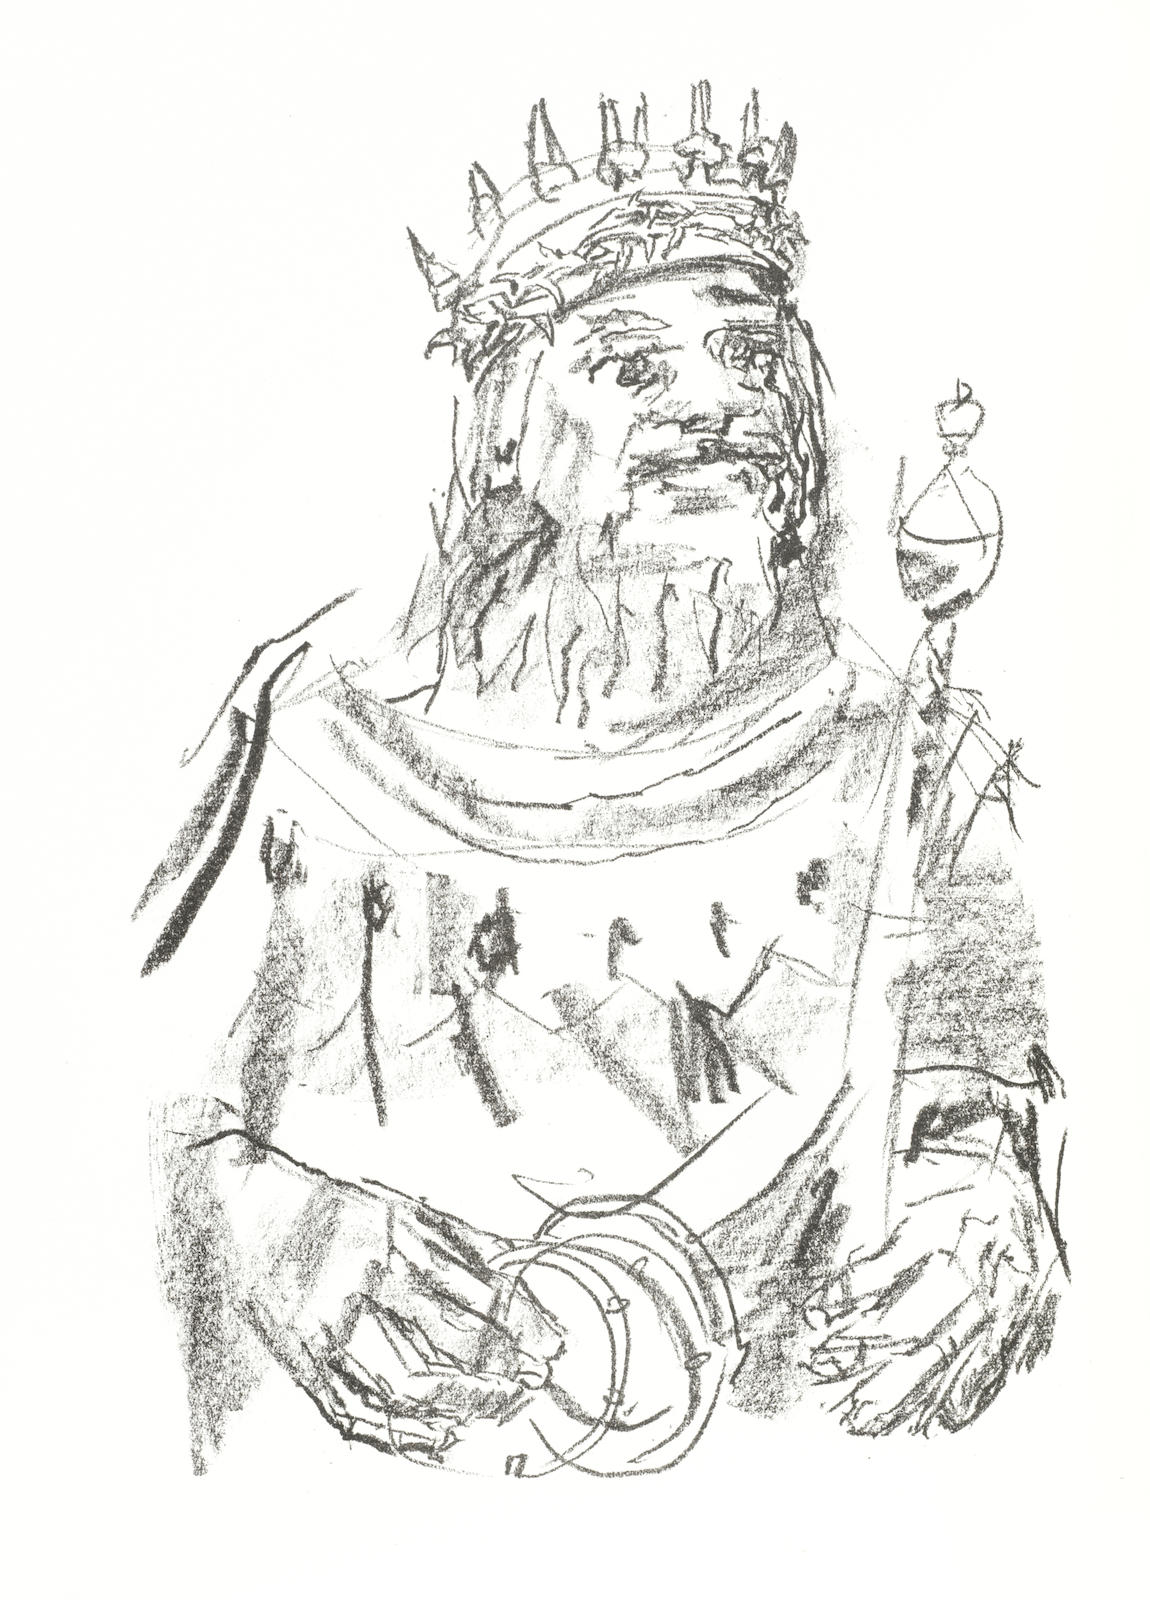 Oskar Kokoschka-King Lear (Wingler & Weltz 223-238)-1963